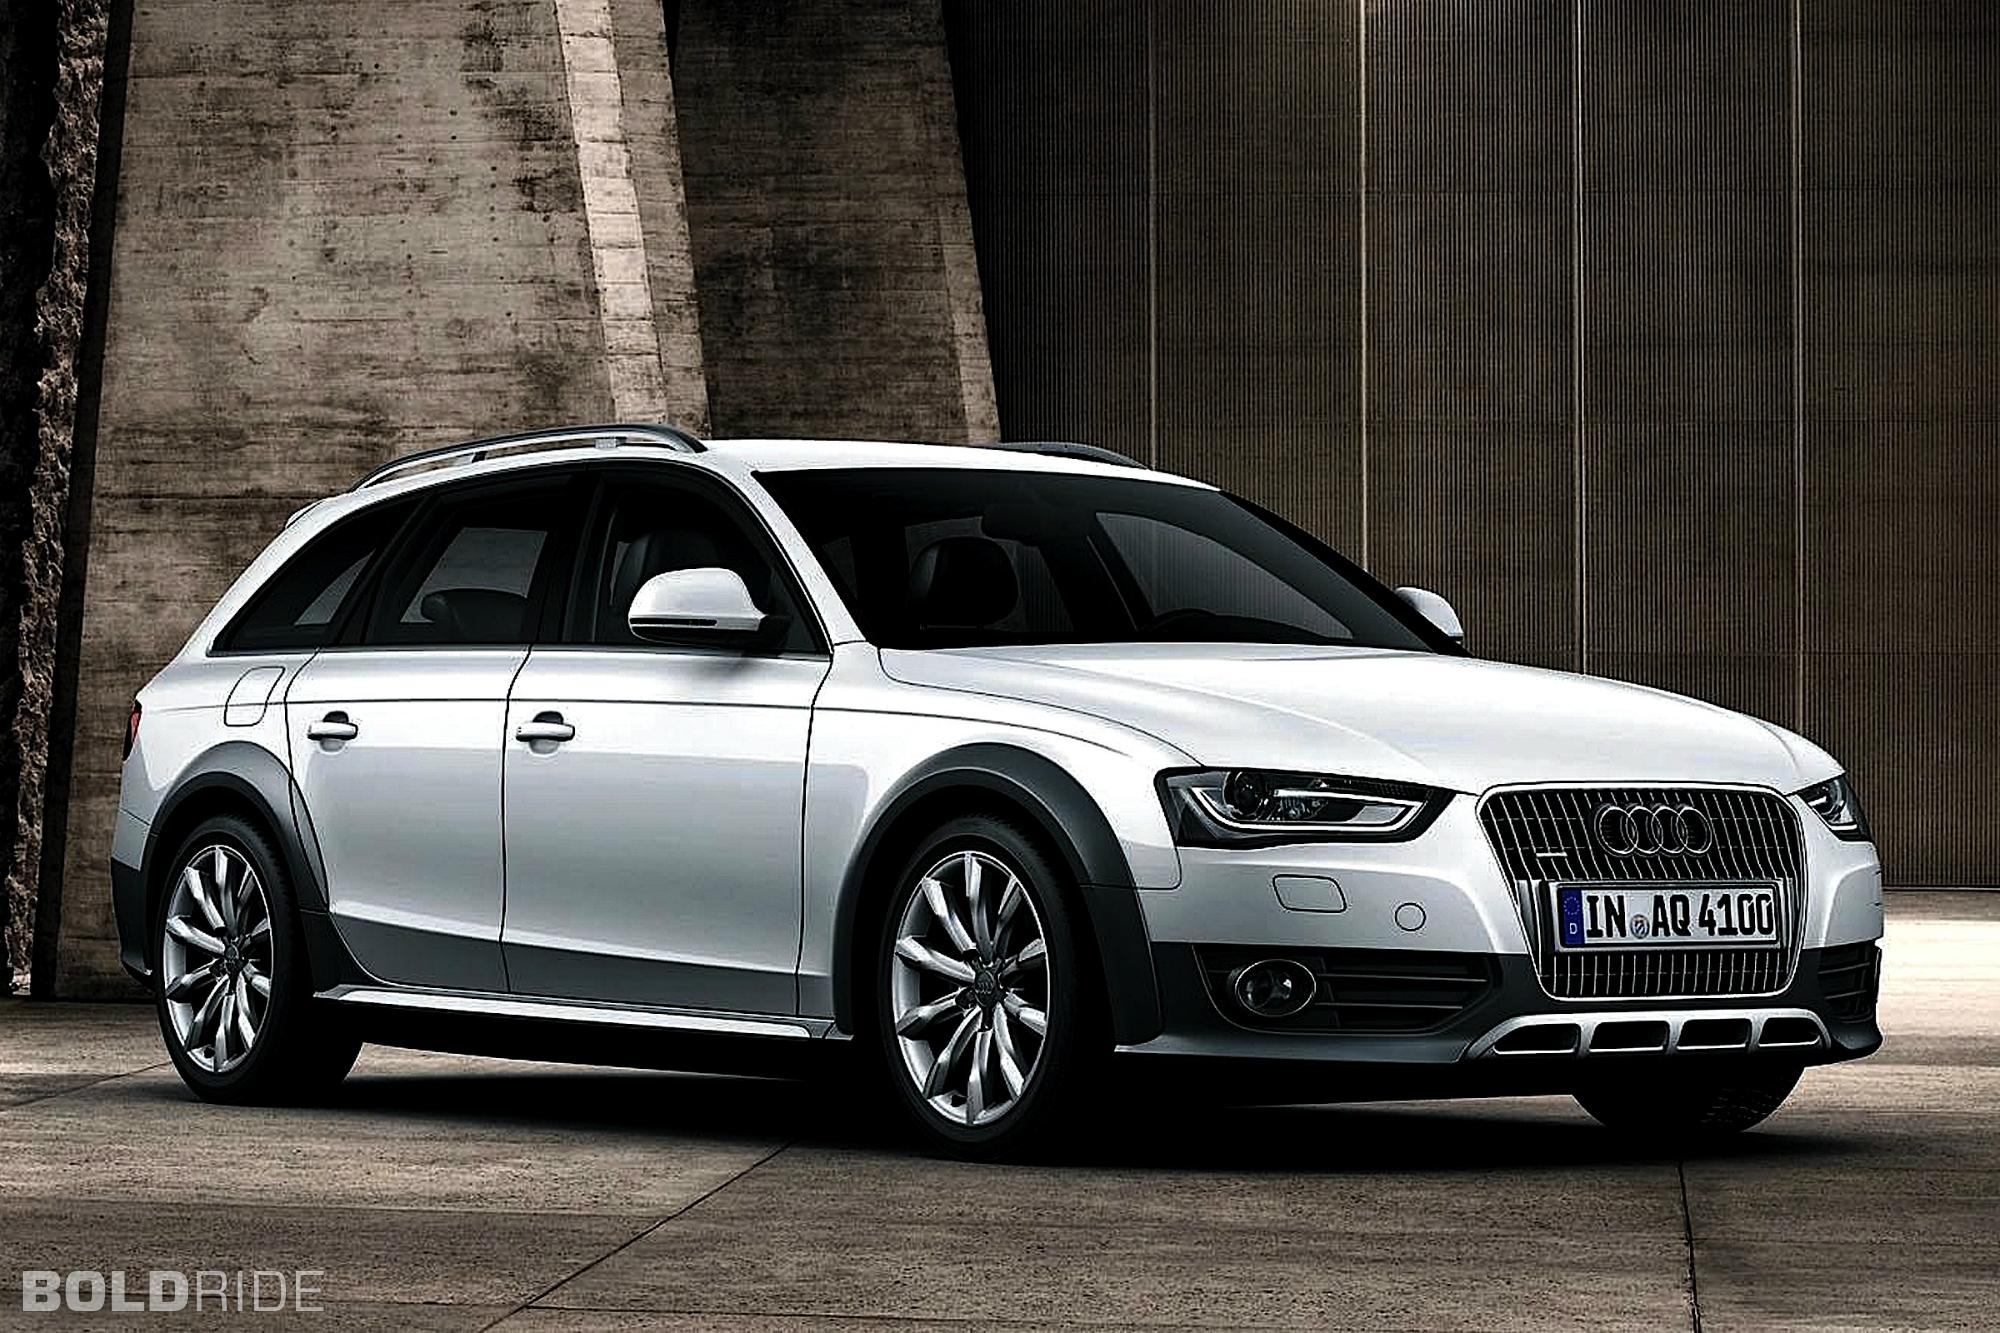 2013 Audi Allroad Image 16